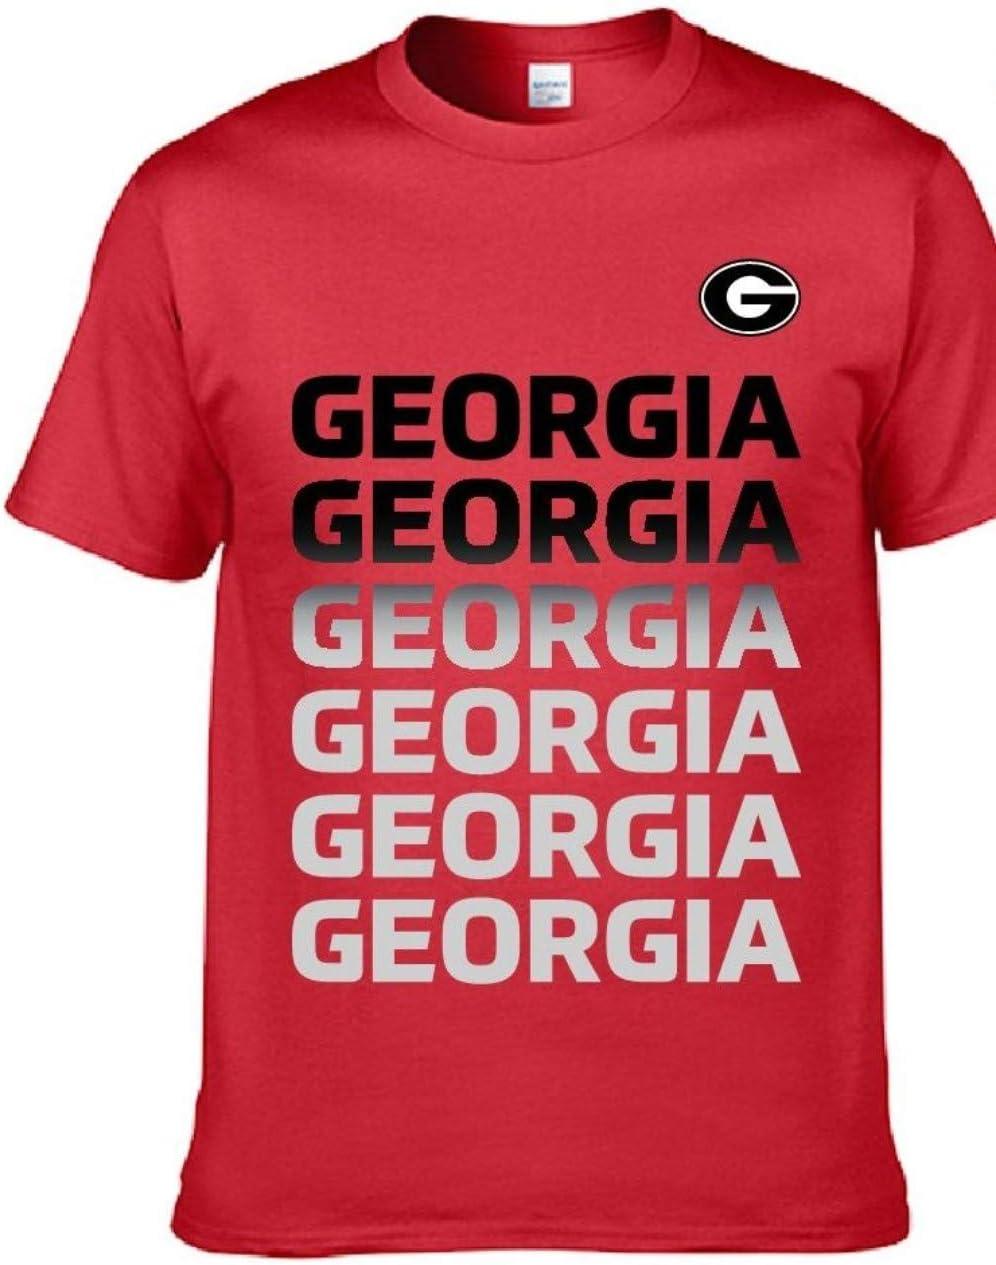 Pro Shop Georgia Bulldogs Short Sleeve Youth Size T-Shirt